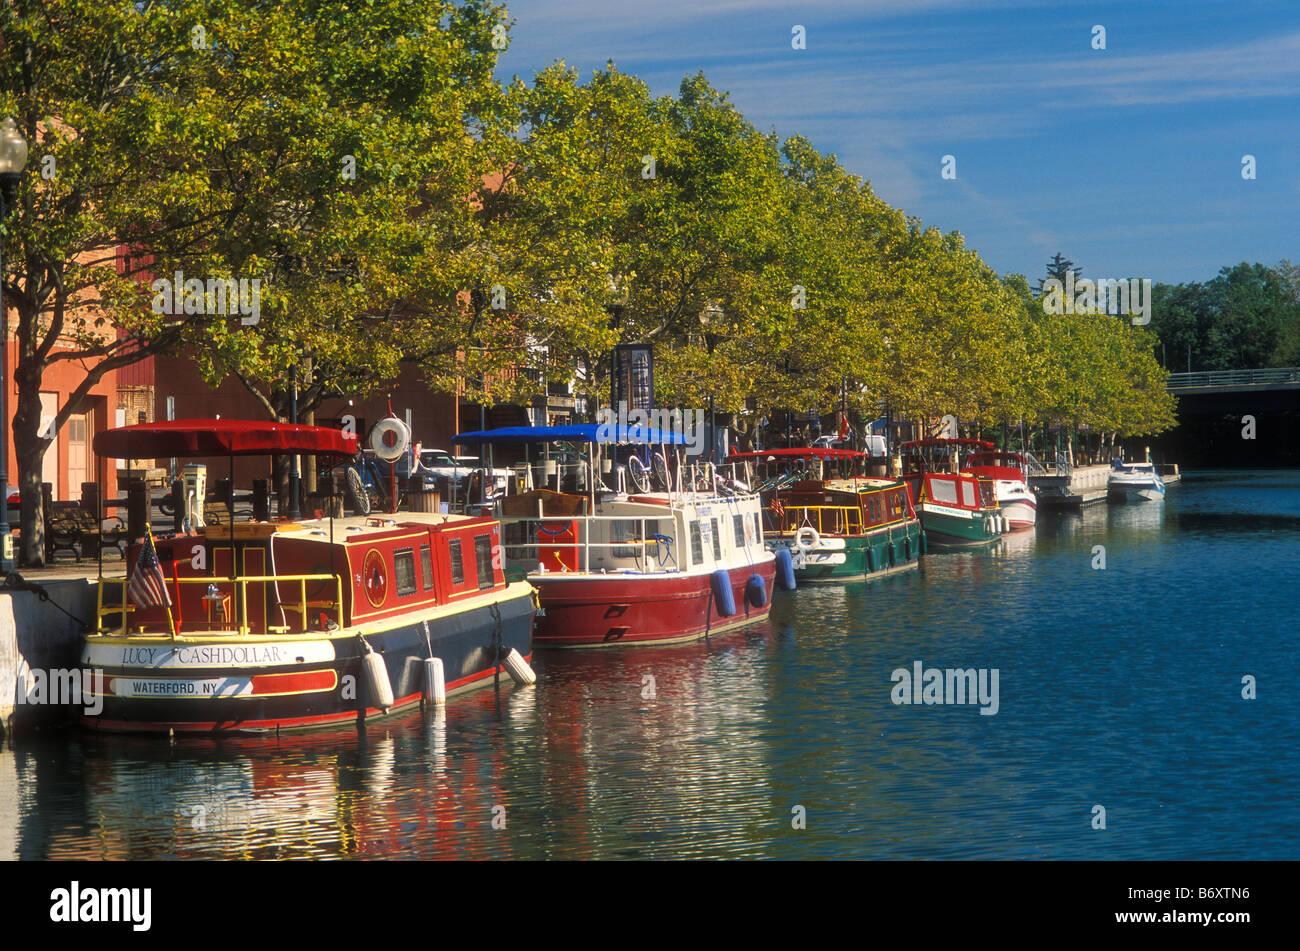 Citaten Seneca Falls : Canal boats seneca falls new york usa stock photo